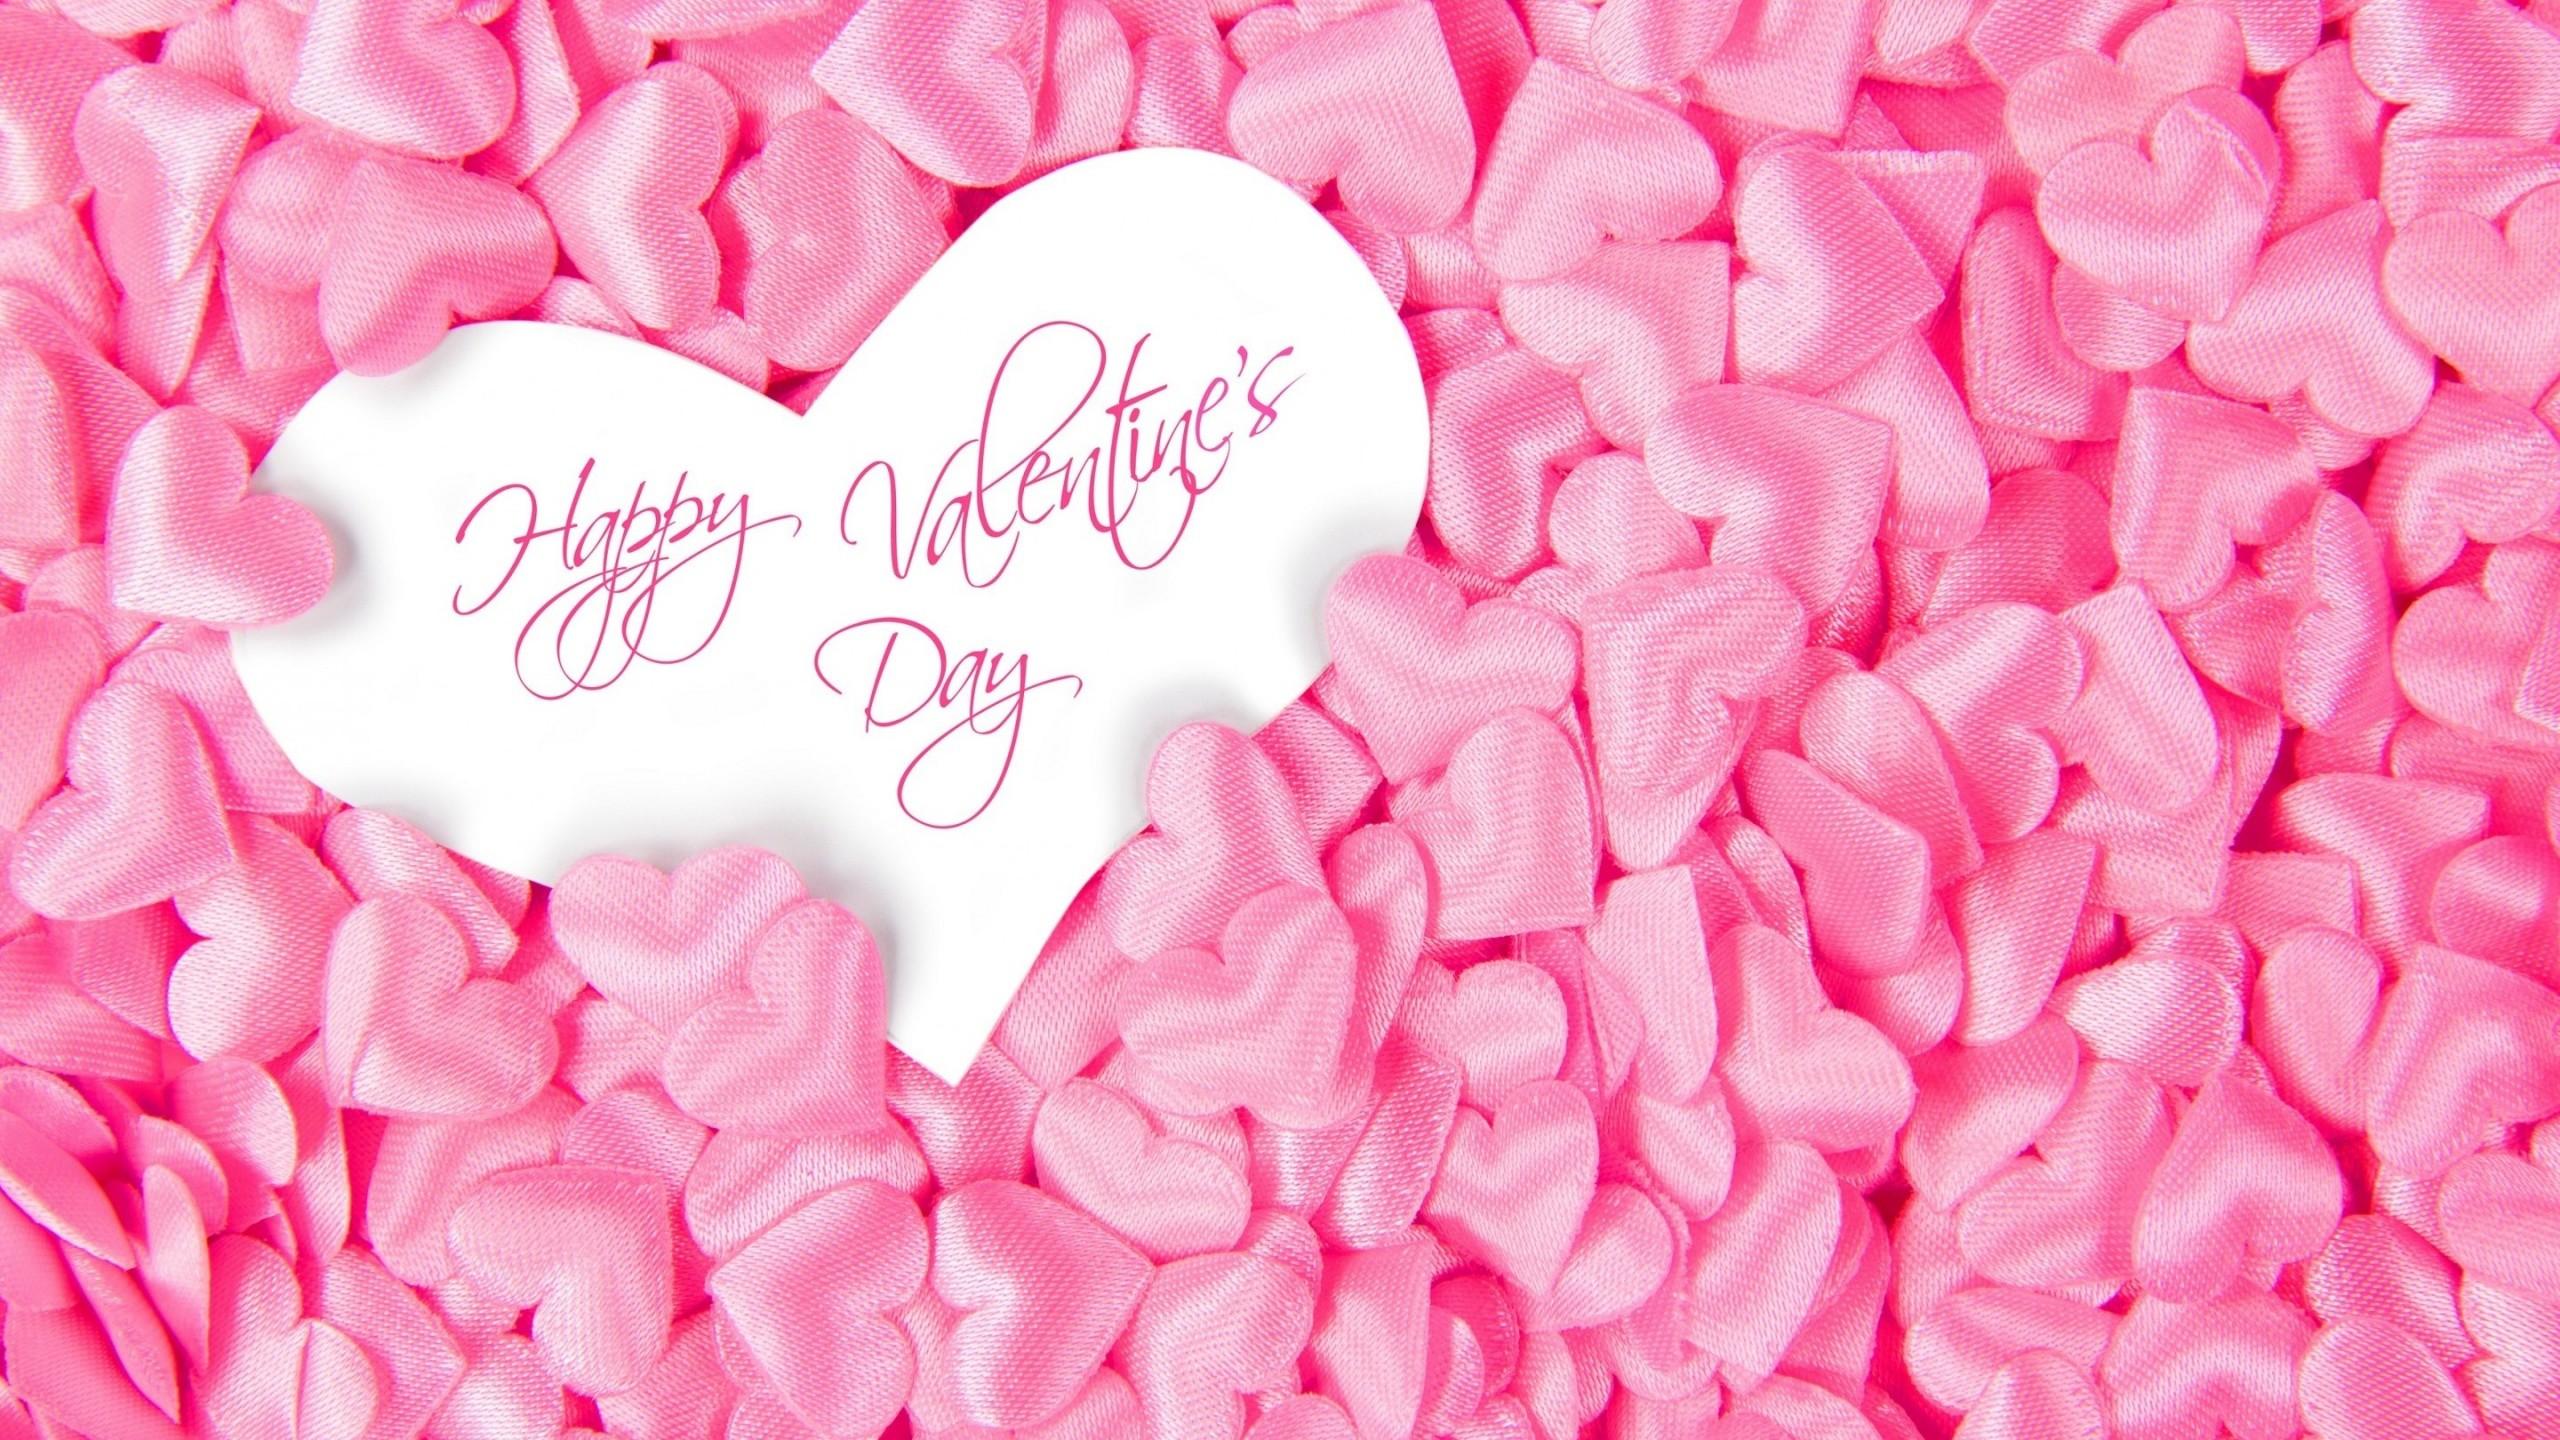 Valentines Day Pink Heart